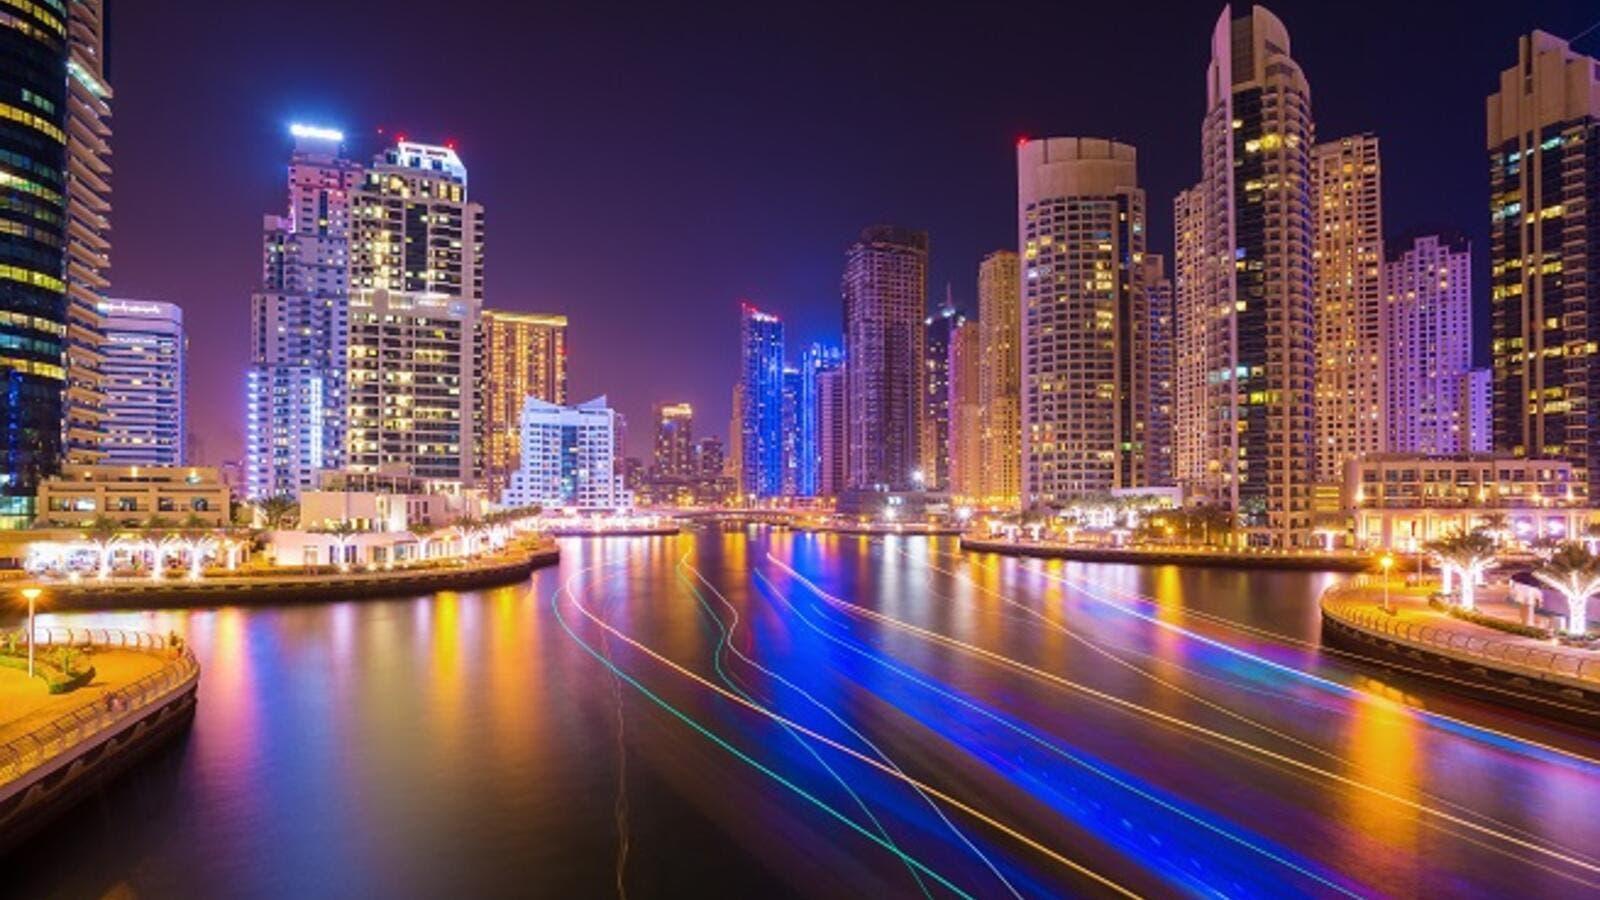 UAE Hospitality Industry to Reach $7 6 Billion by 2022 | Al Bawaba